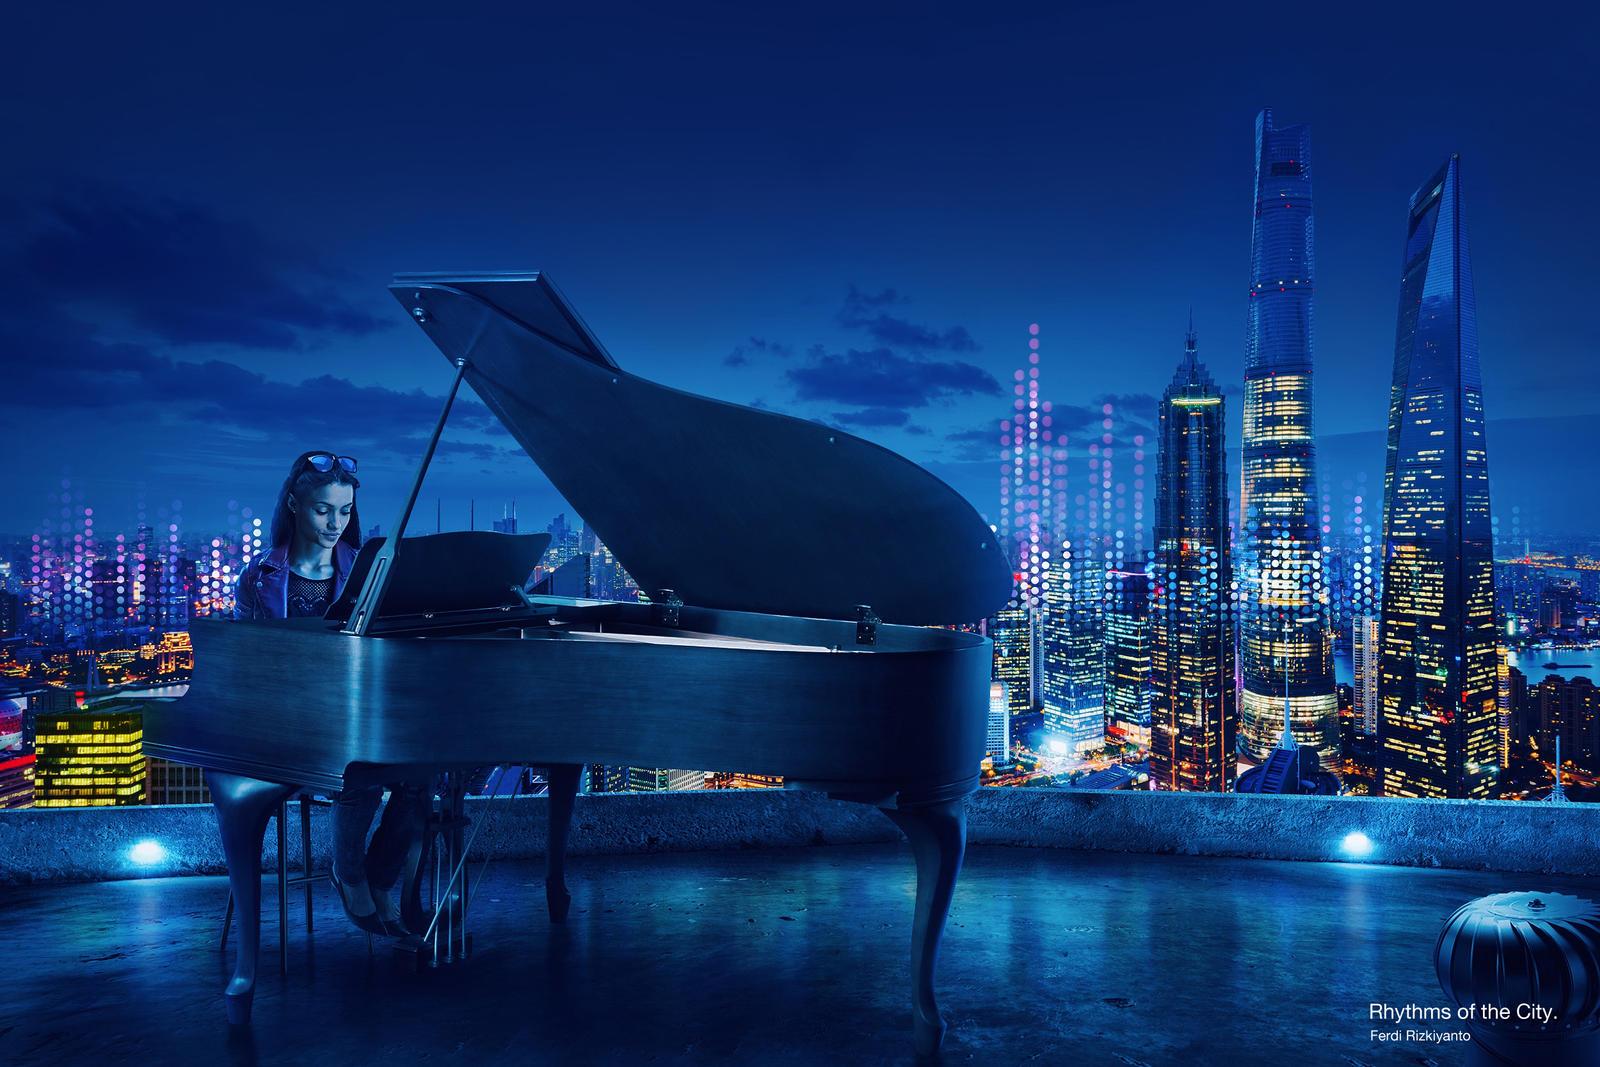 Rhythms of the City - Piano